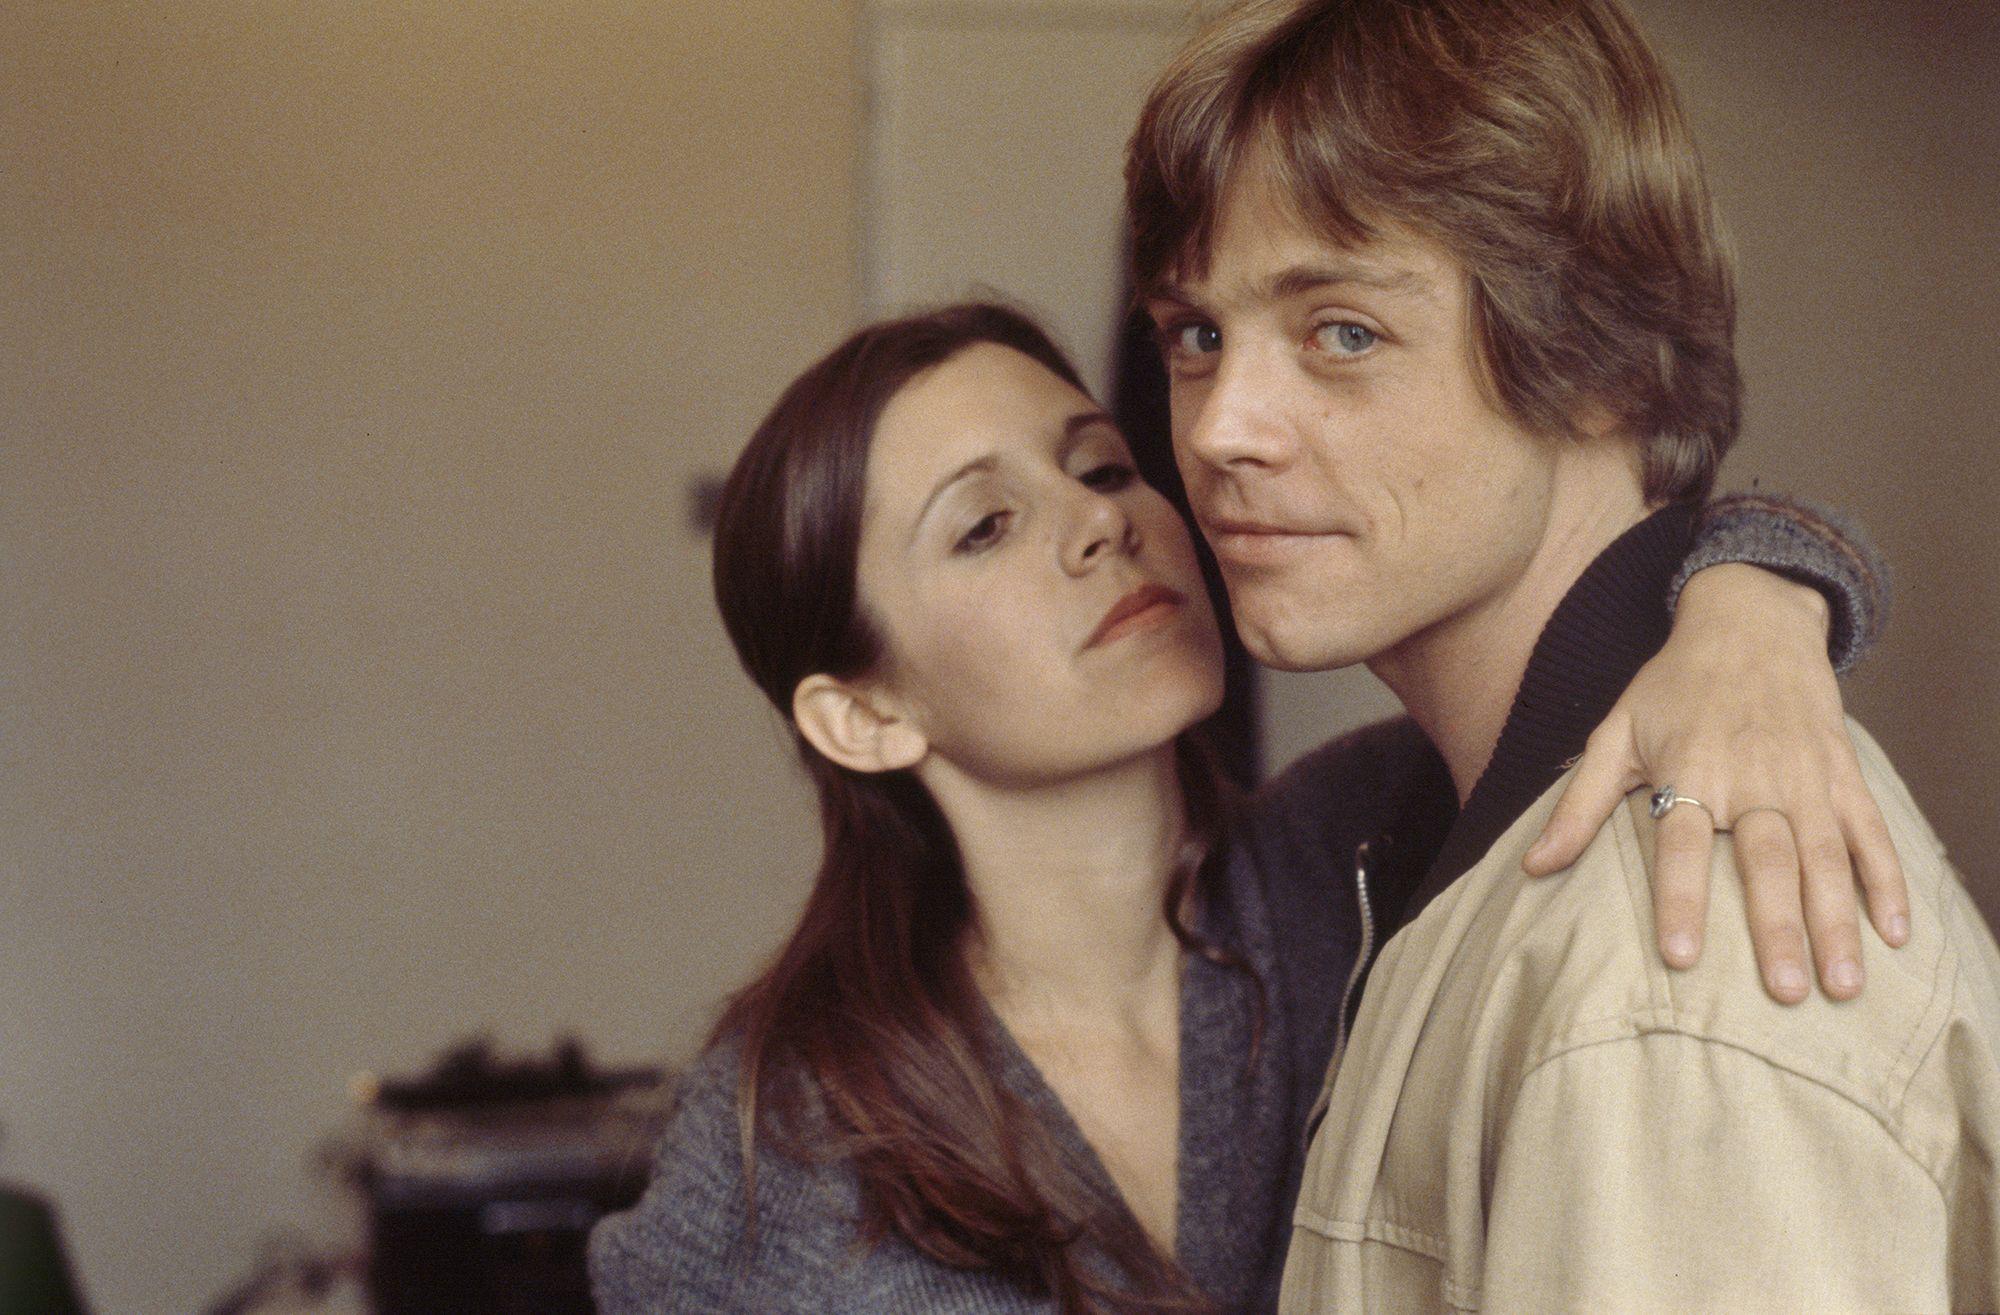 Star Wars: Mark Hamill Twitter 20 Años Sin Ver Trilogia Original